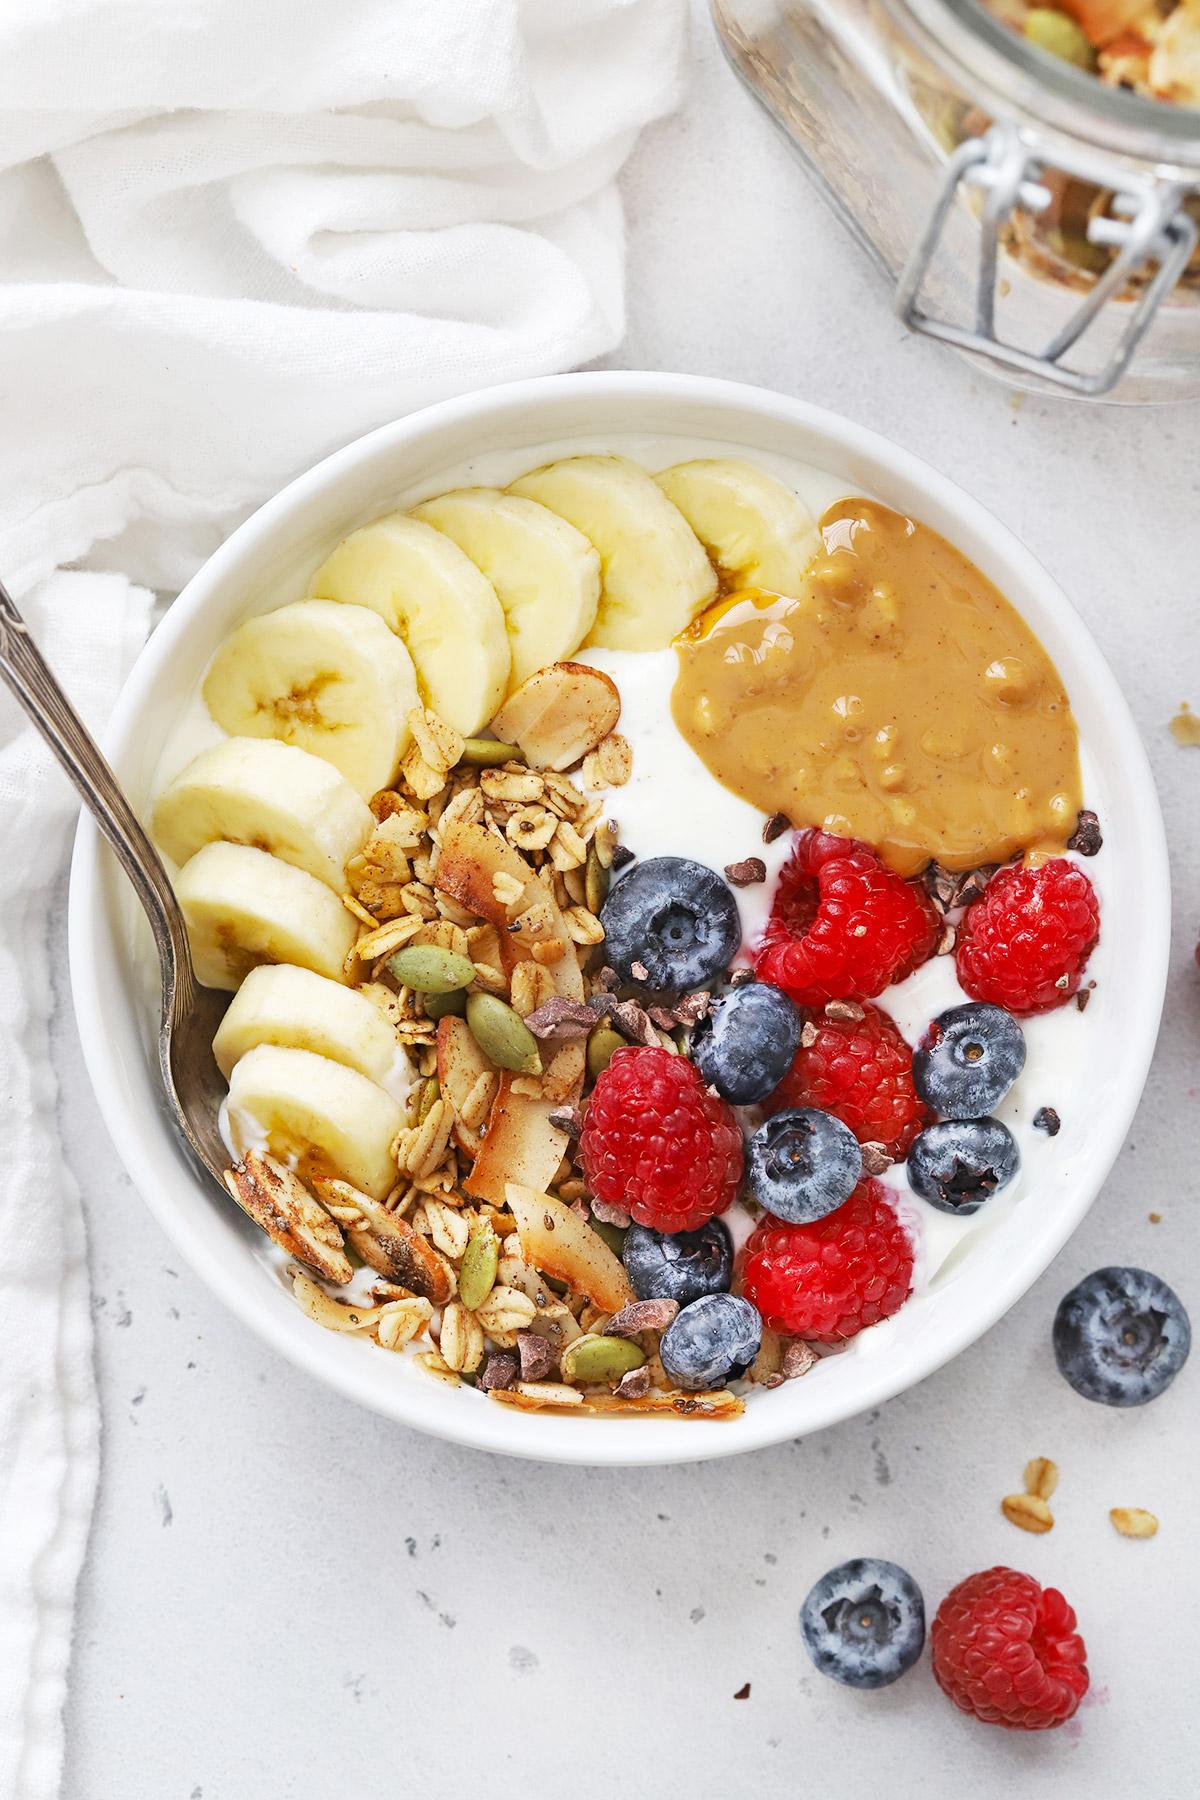 Yogurt Bowl with Warm Spiced Granola, fresh berries, sliced banana, and peanut butter